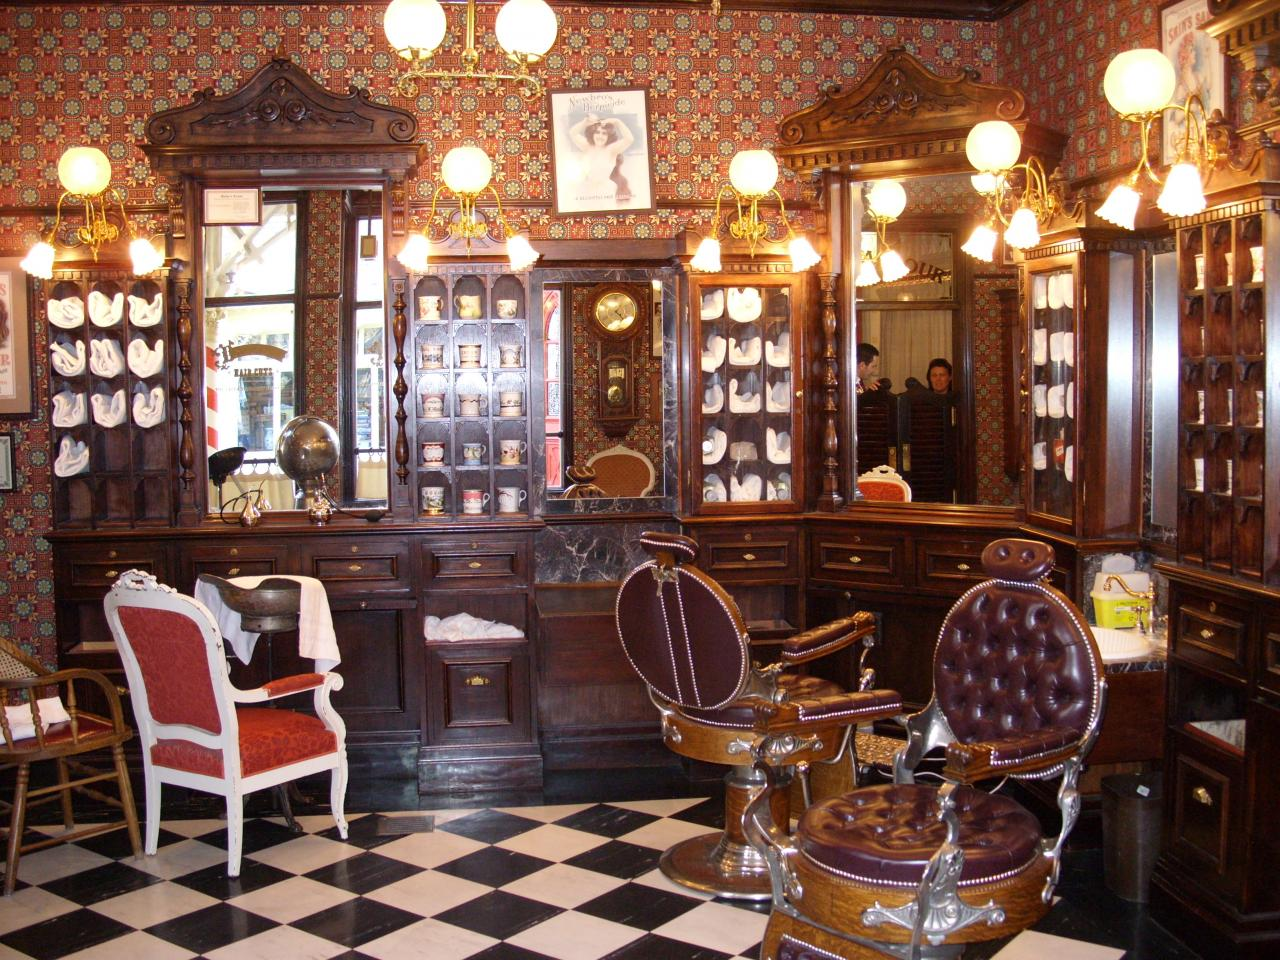 Le barbier de main street dapper dan 39 s hair cuts for Interieur hotel disney